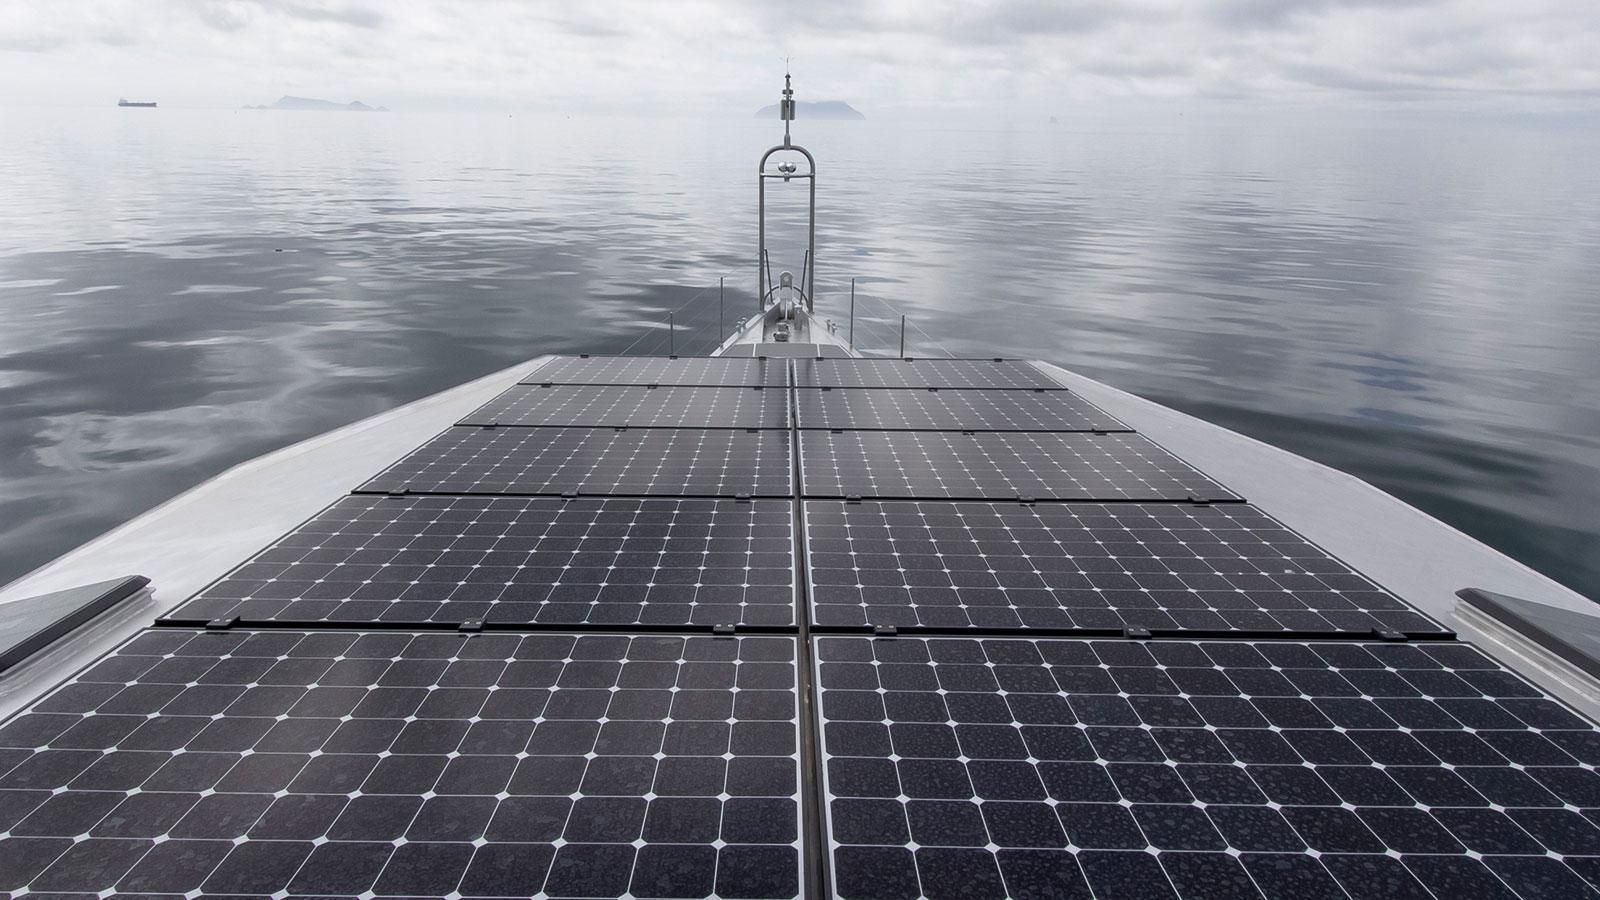 iceberg-motor-yacht-circa-marine-fpb-97-2015-34m-solar-panels